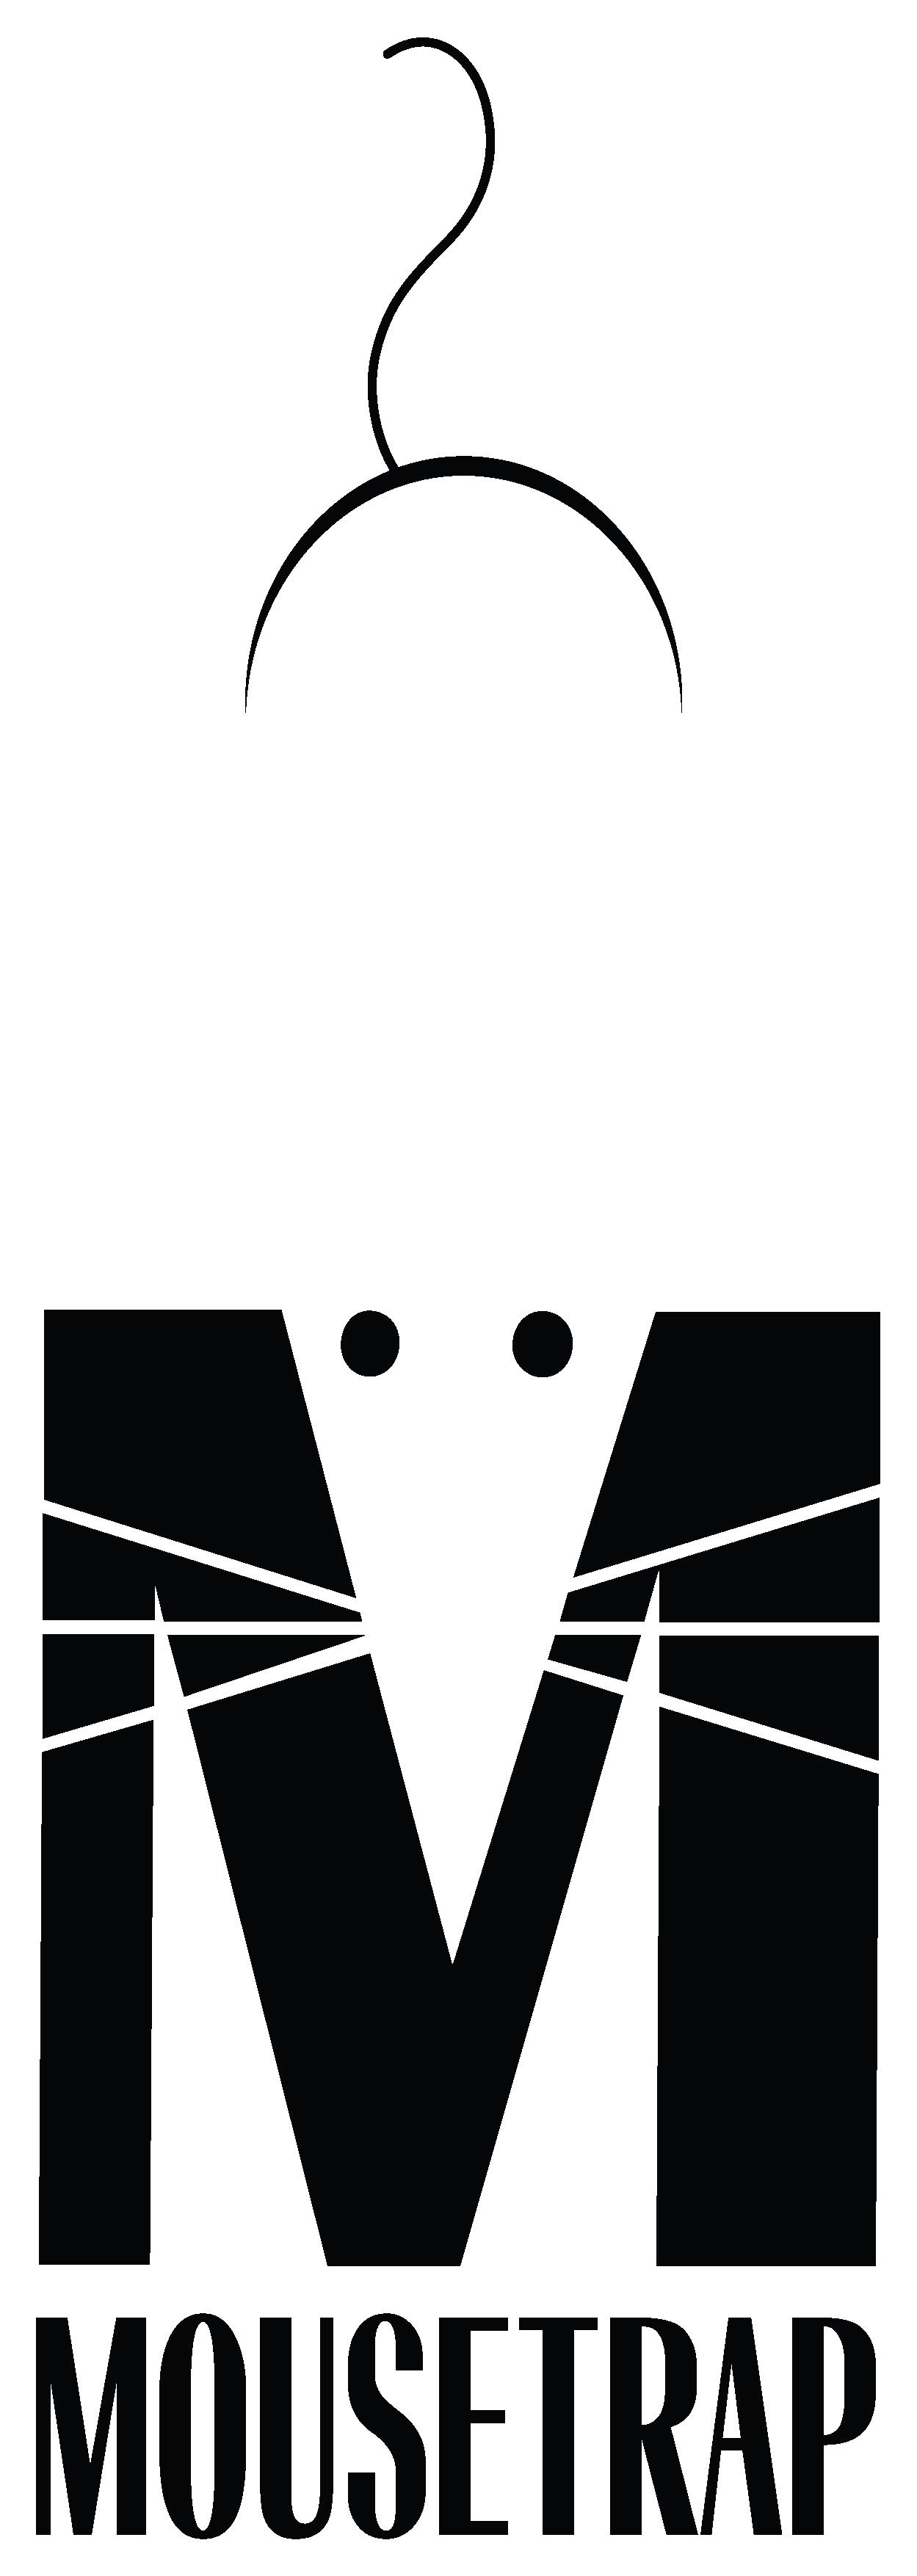 Mousetrap_2019_Full Lockup Black (4)